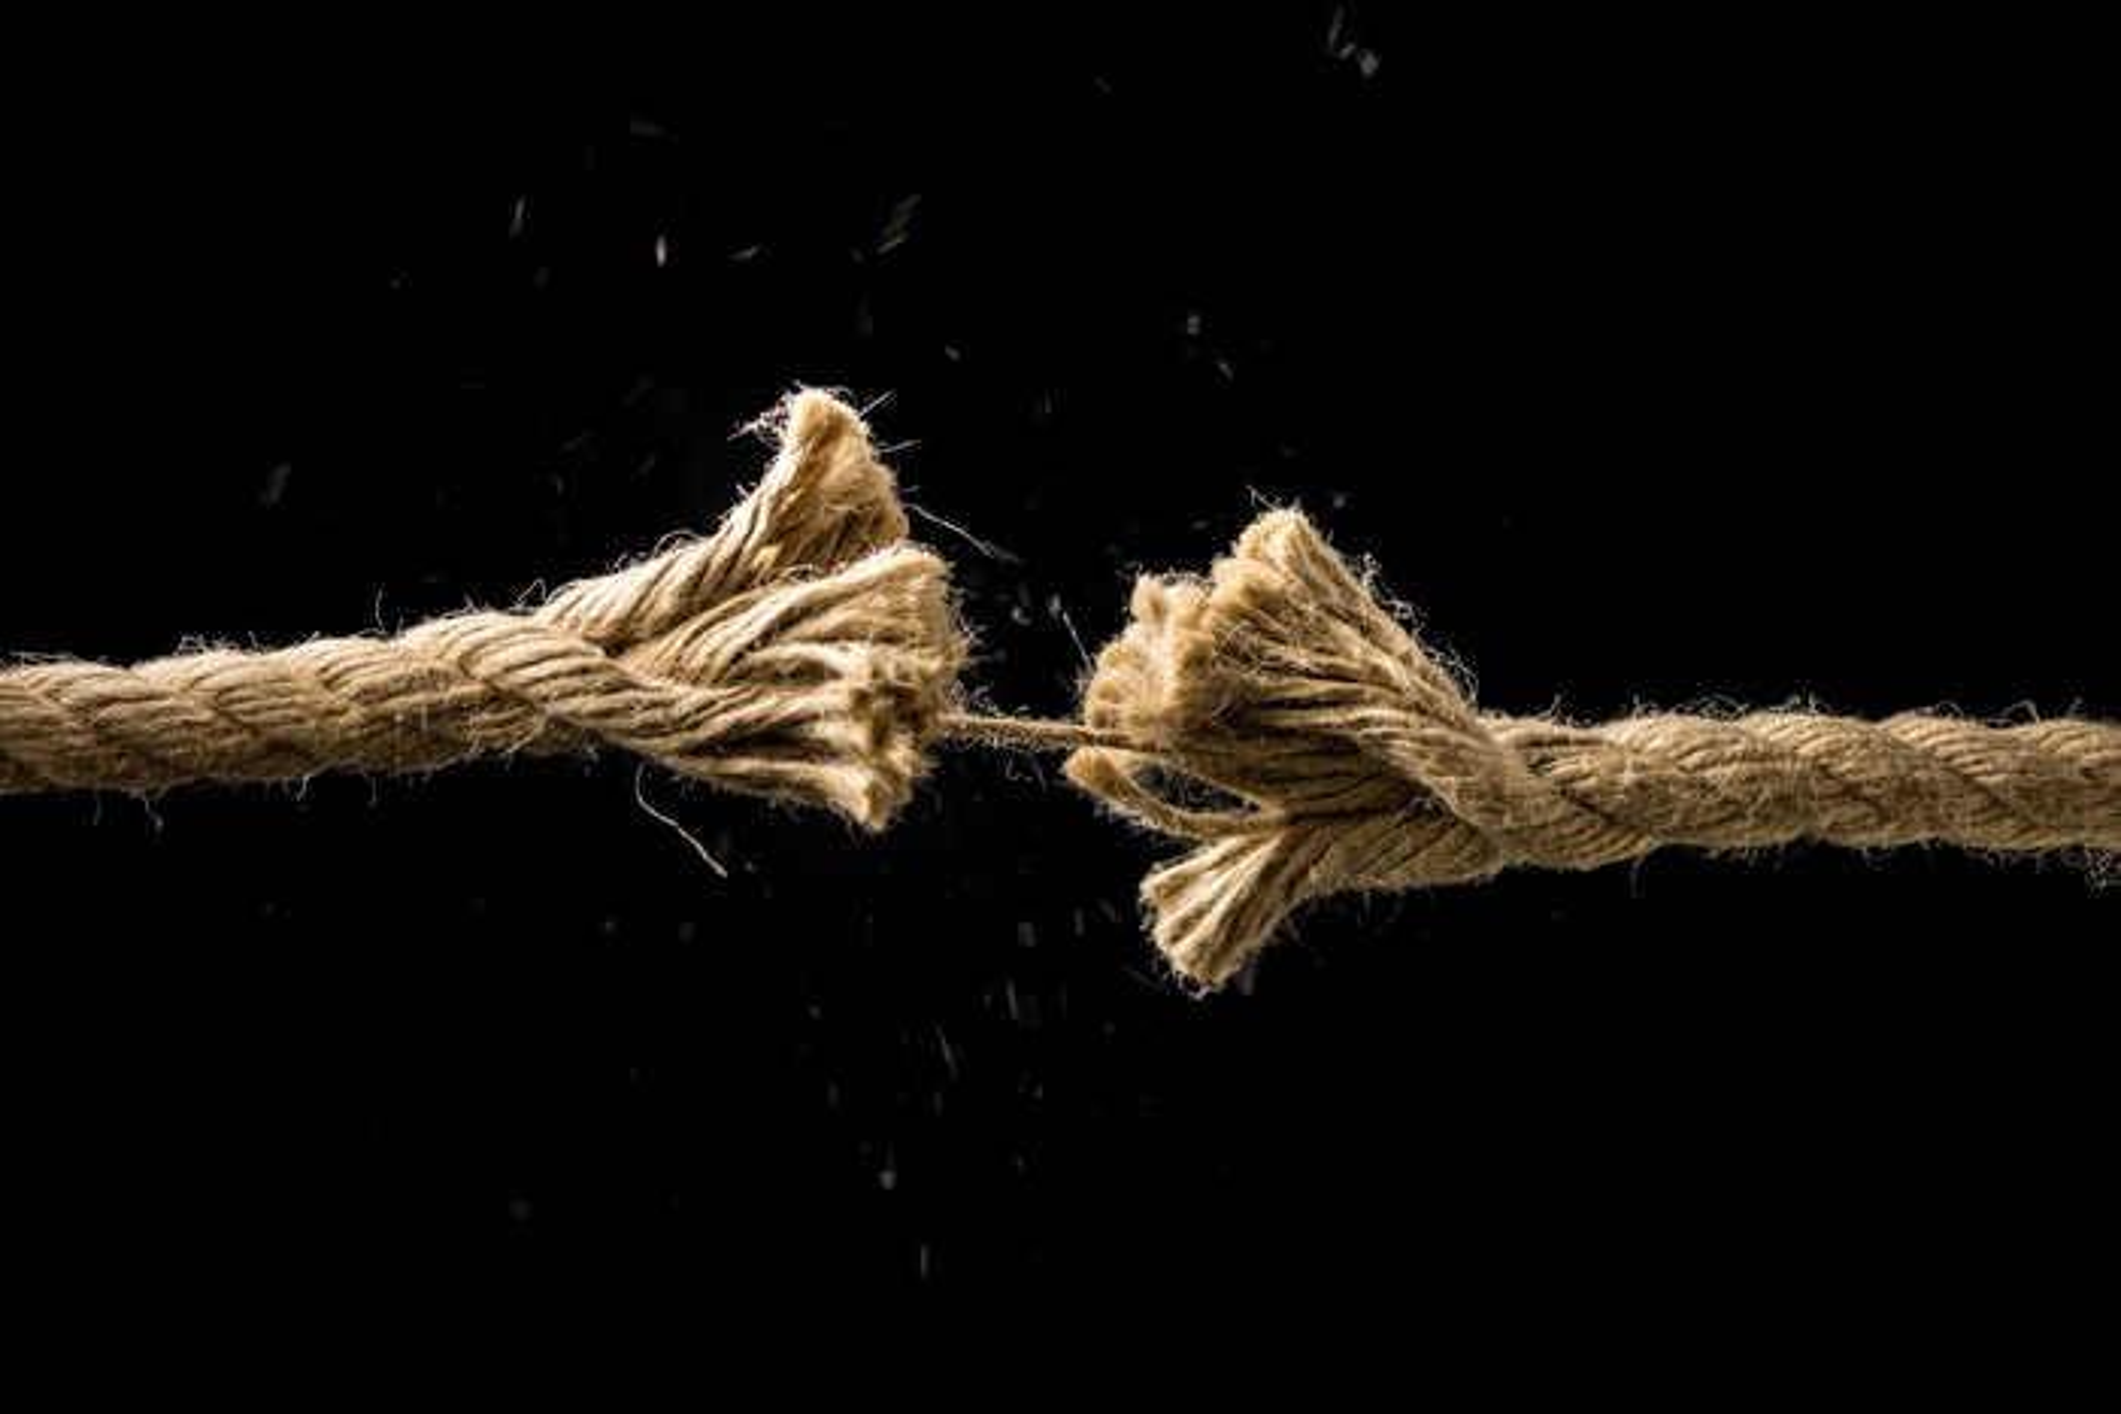 A rope unwinding.